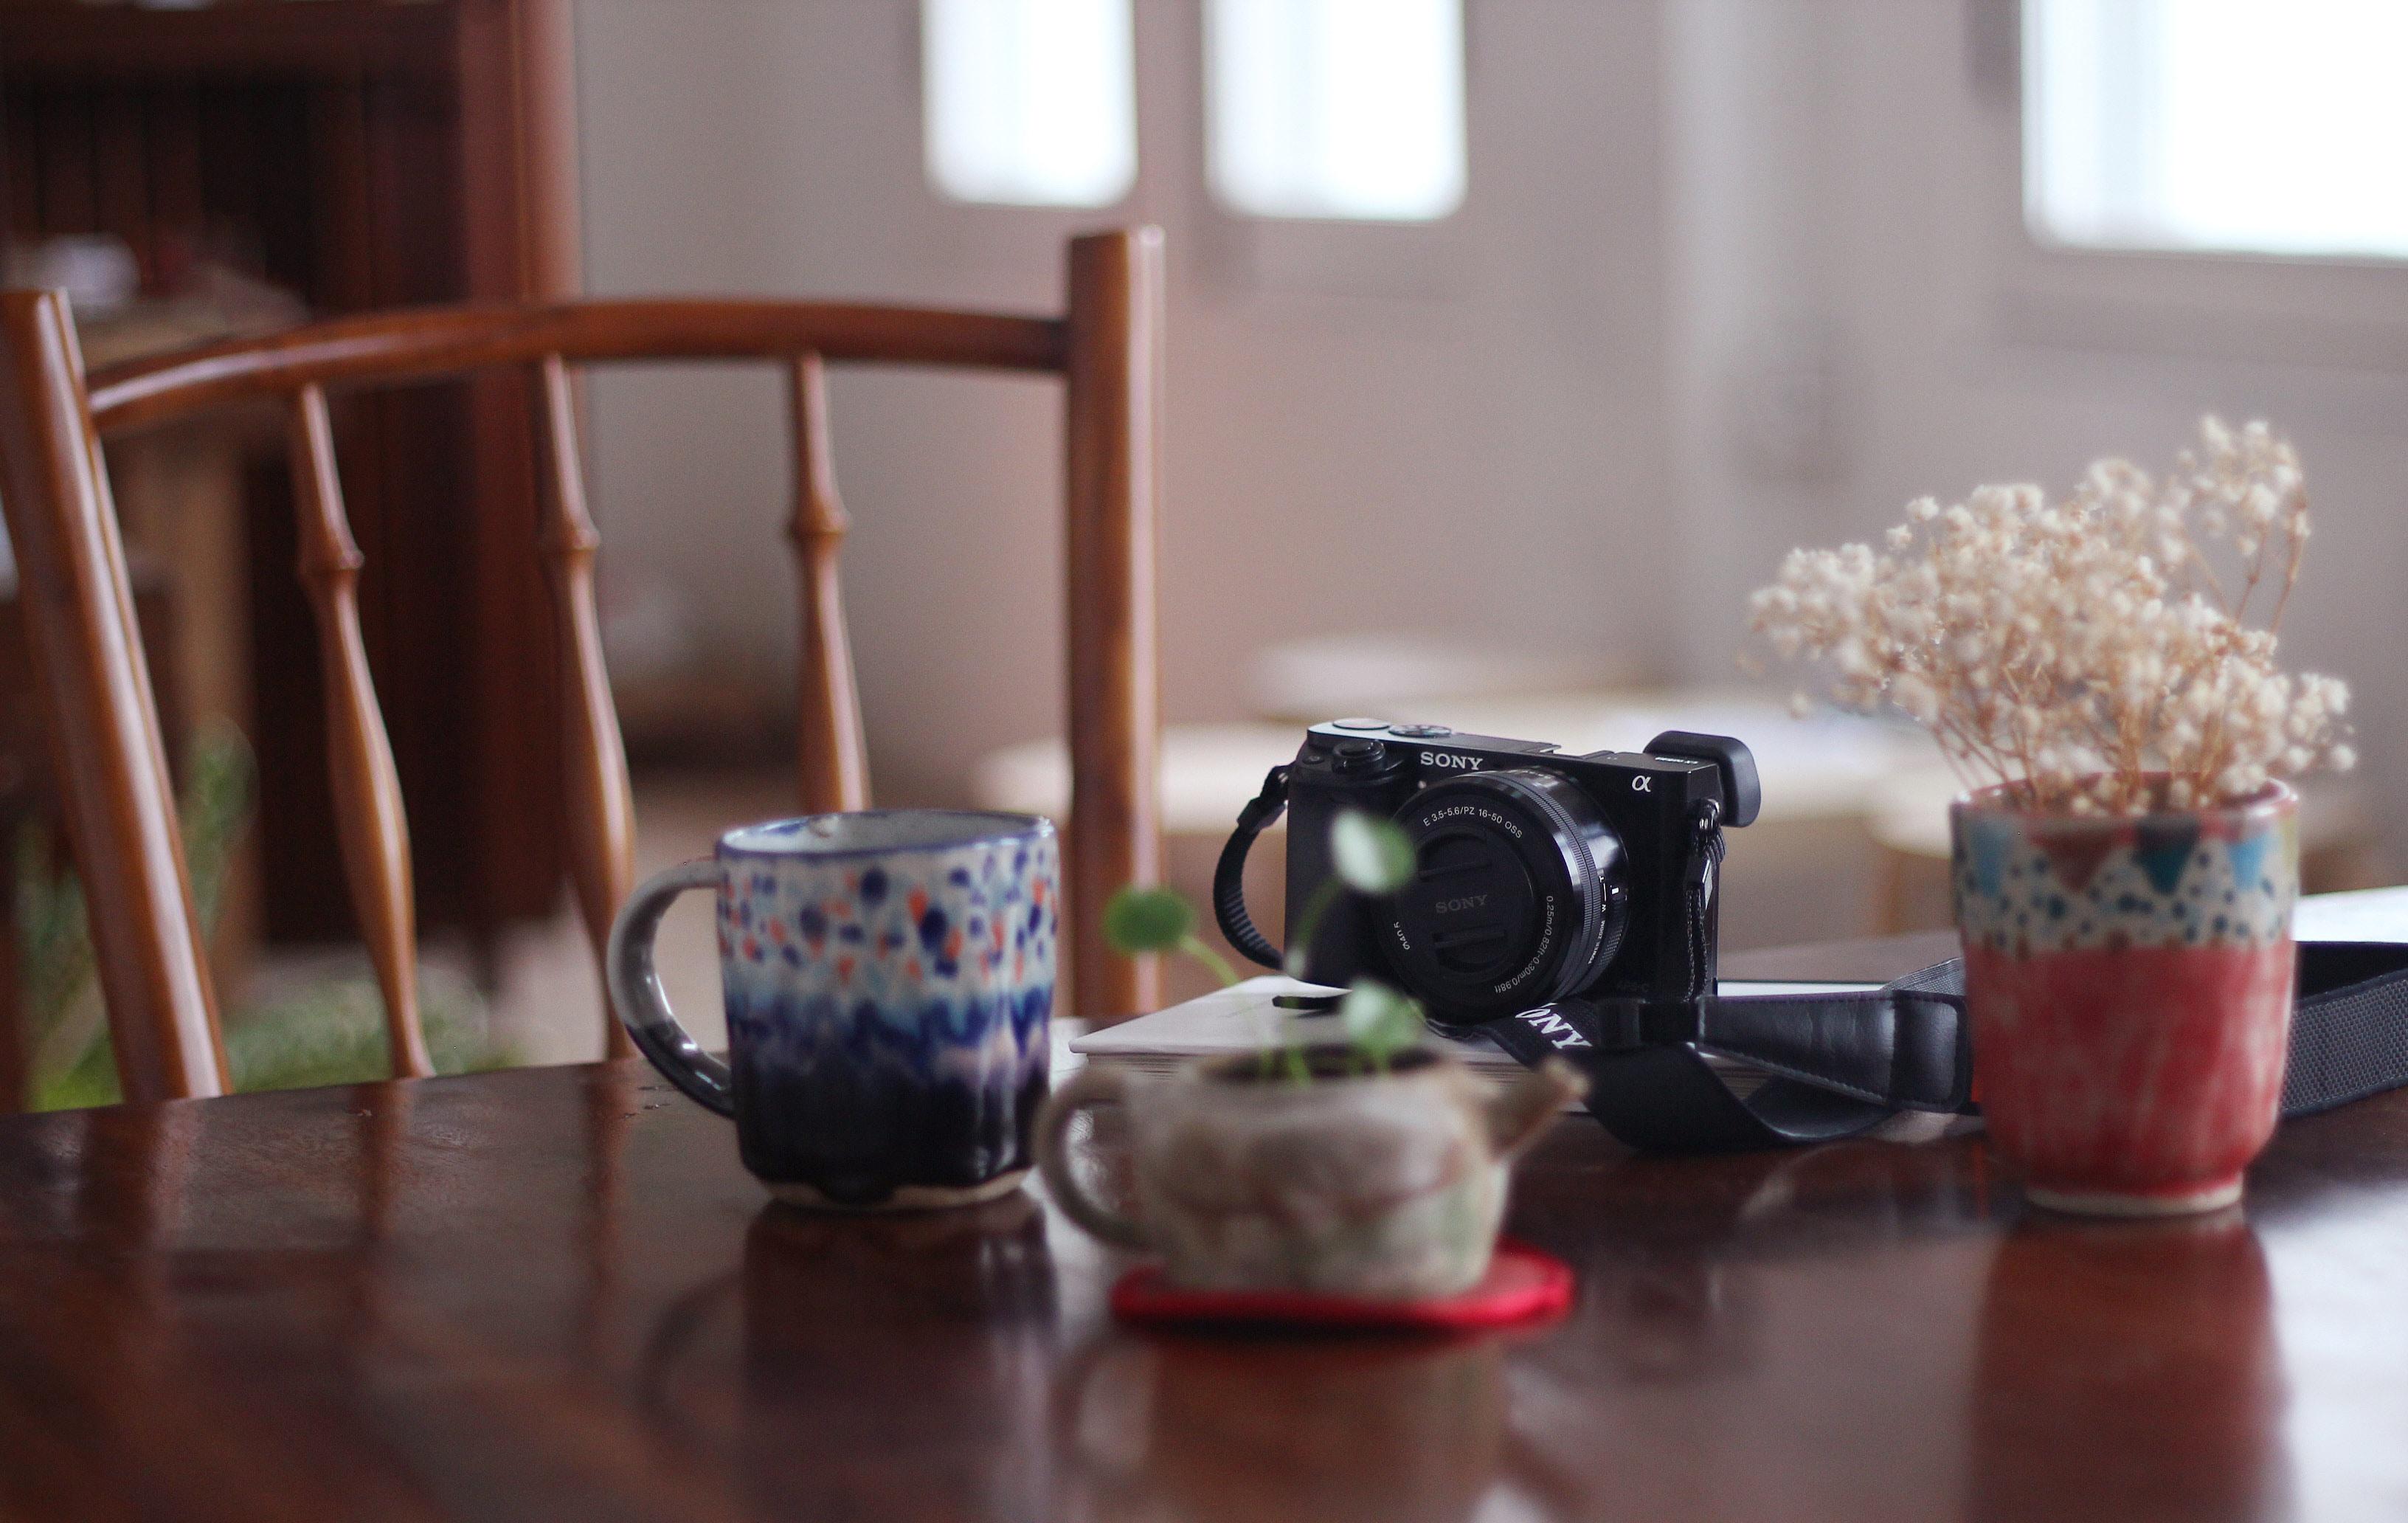 A polka dot mug, Sony camera, and plant on a table a Semasa Cafe And Shop